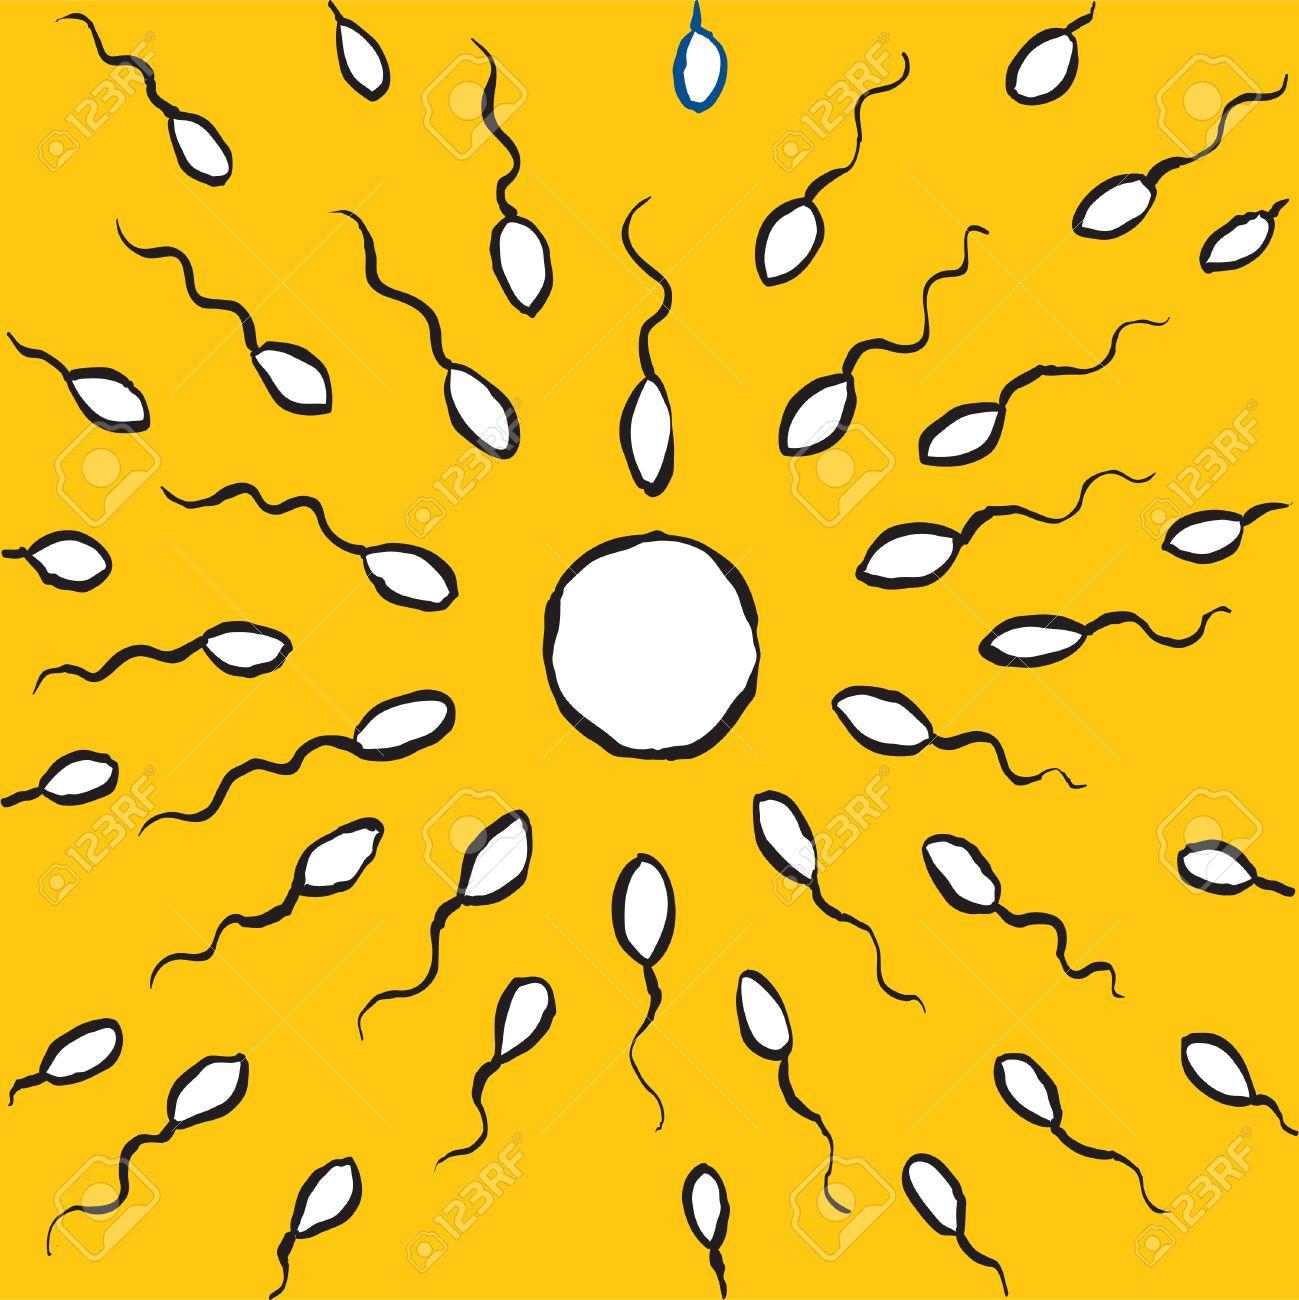 Cartoon sperm cell